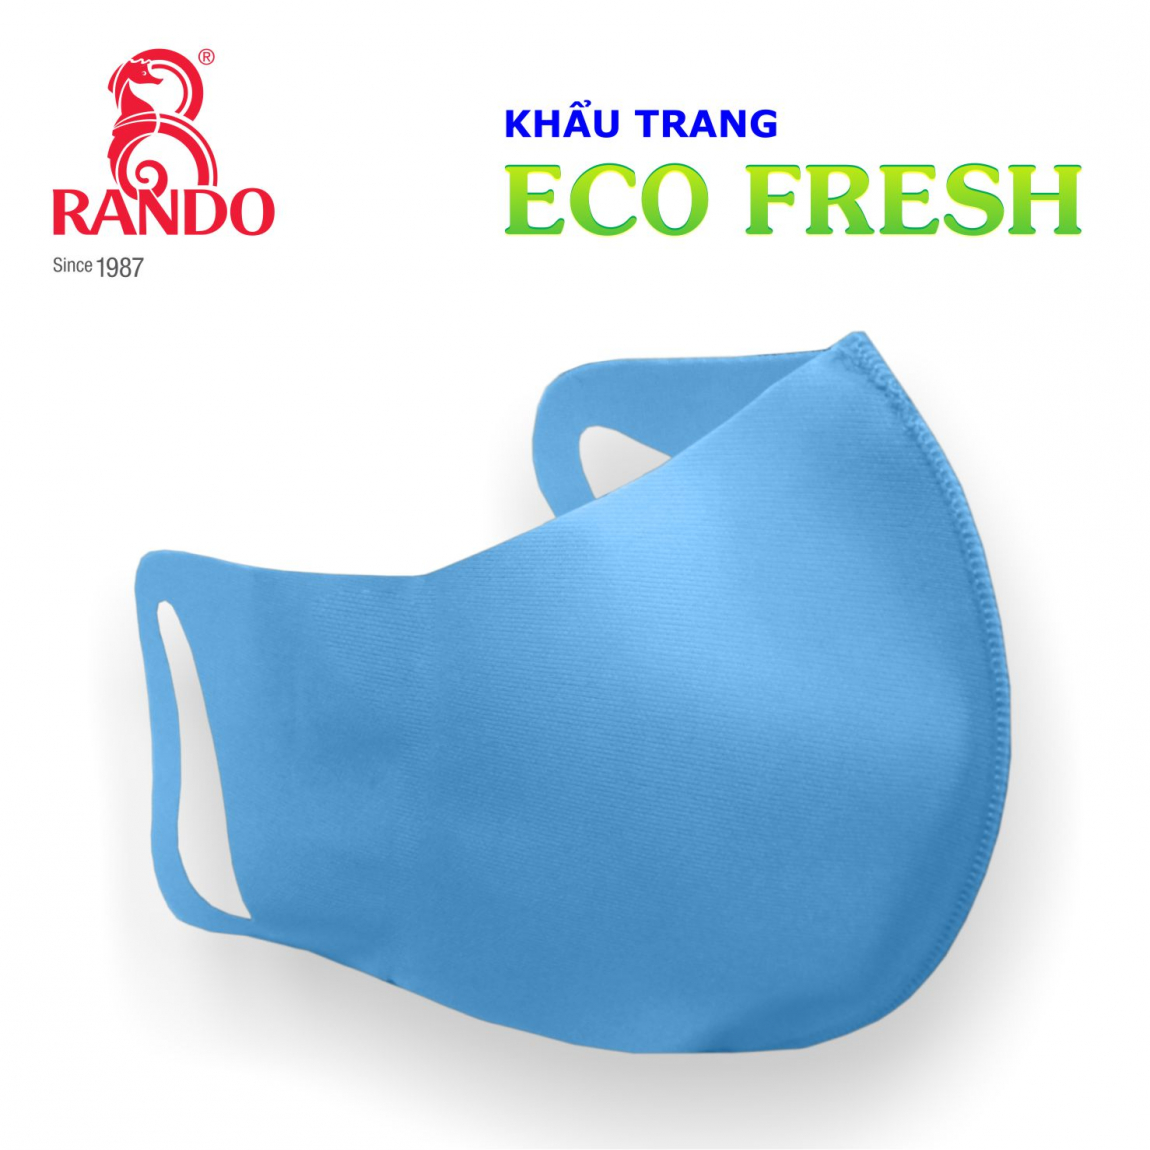 Khẩu trang vải kháng khuẩn ECO FRESH